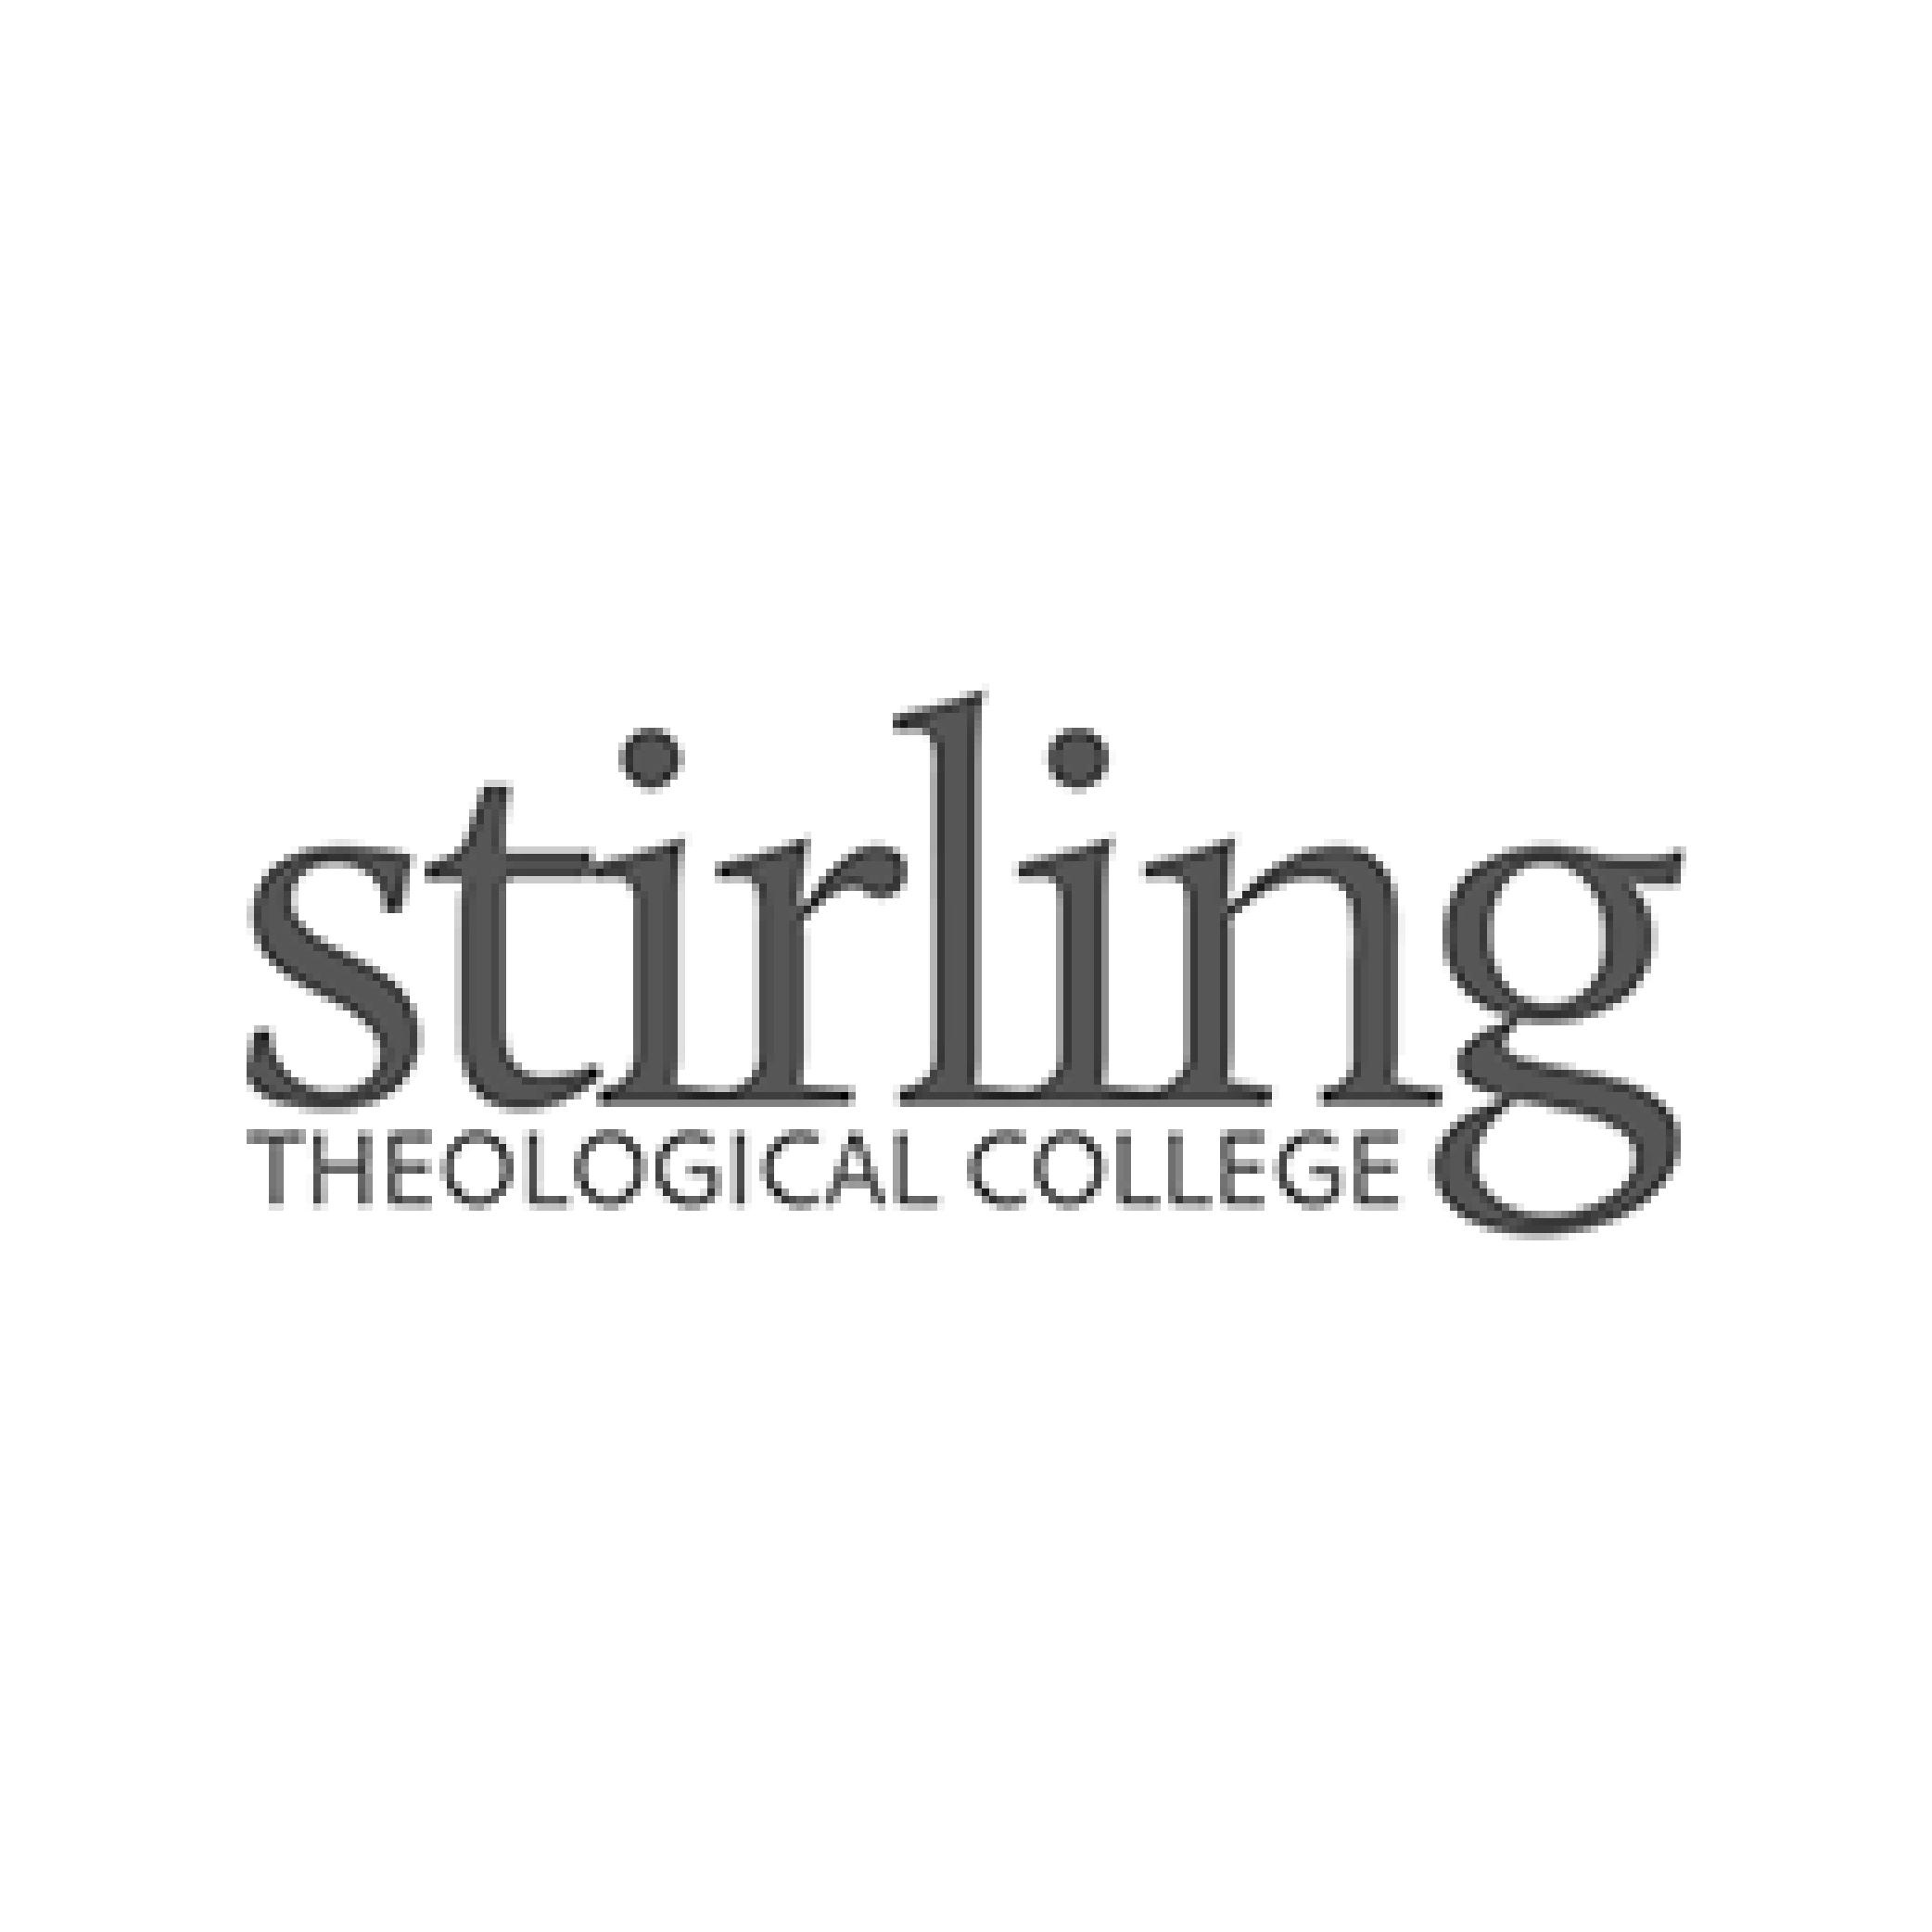 College Logos Square-Stirling